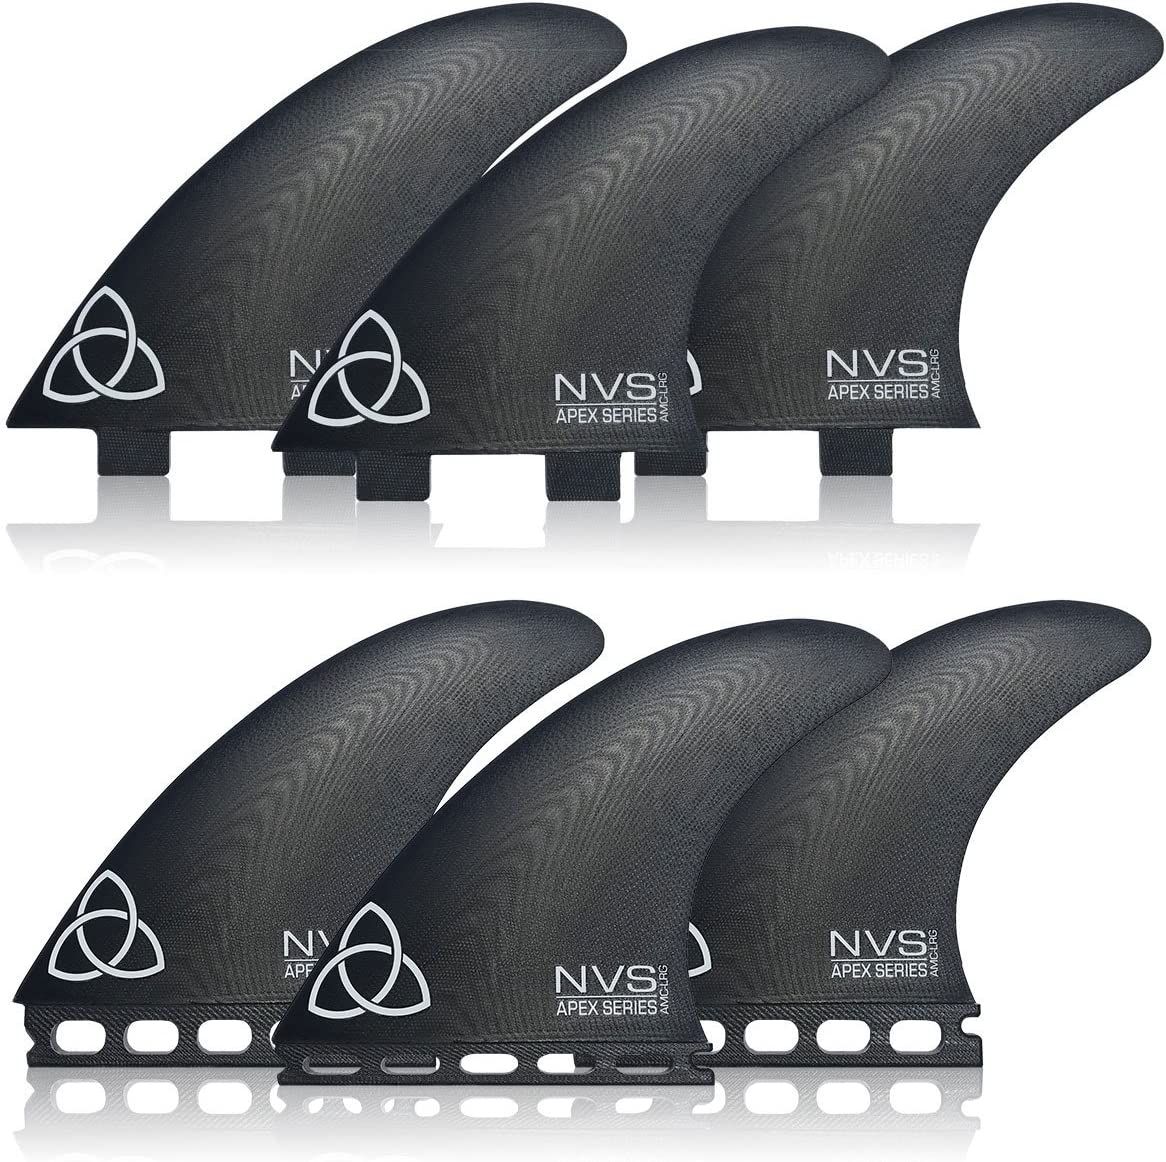 1 Each Steel 3//8 dia Thrds. x 1-3//4 Lg w//5//16-18 x 1//2 Lg Standard Type Hex Head Shoulder Screw Holo-Krome